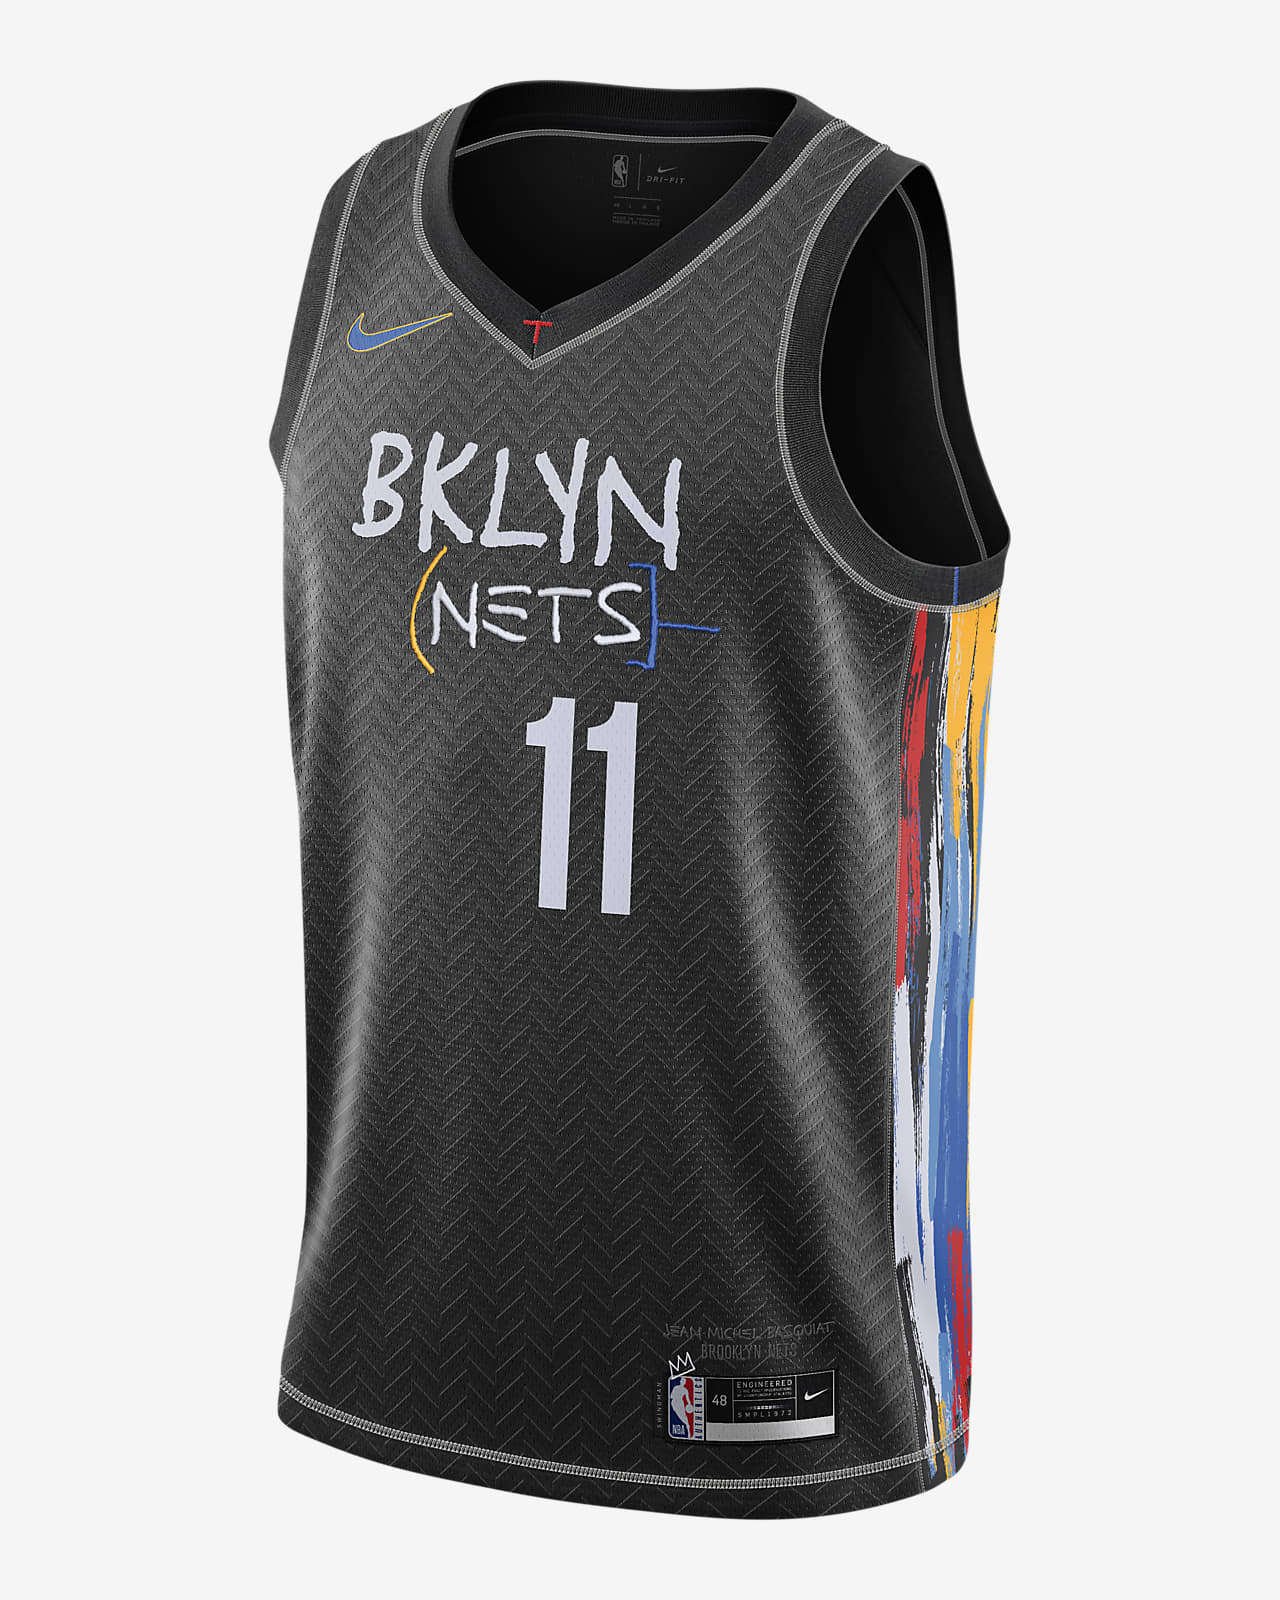 Maillot Nike NBA Swingman Brooklyn Nets City Edition